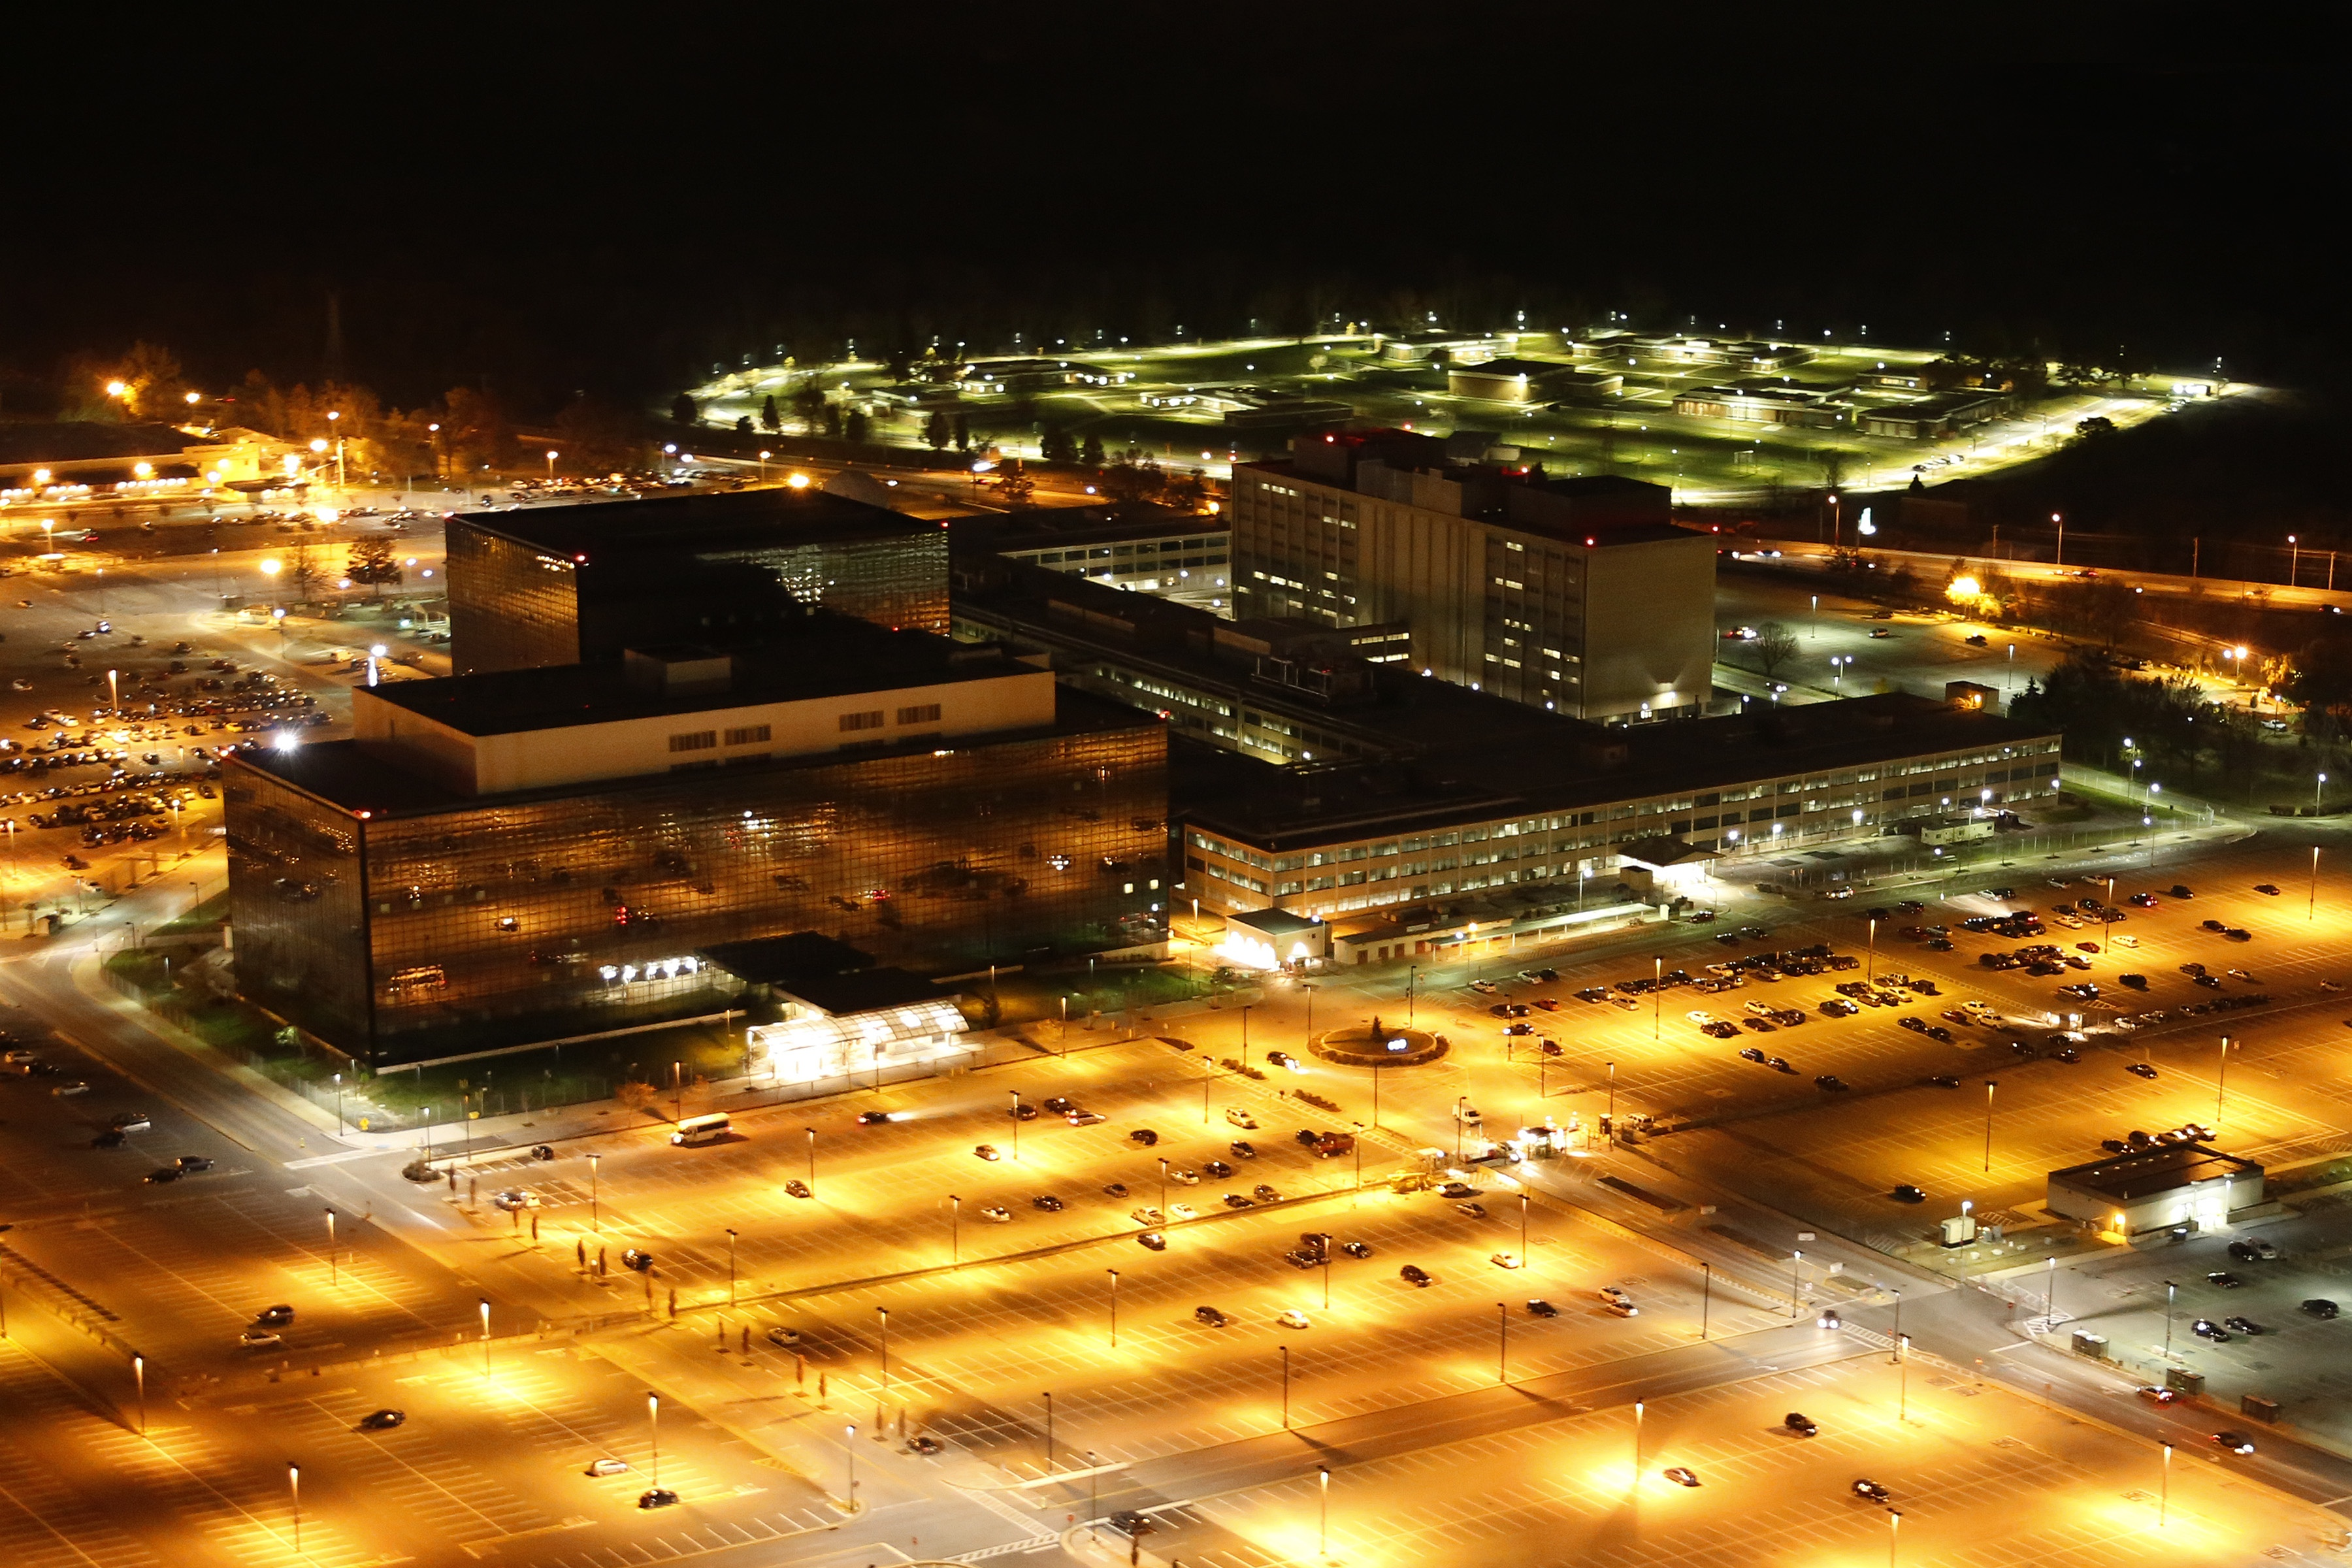 Hauptquartier der NSA, Foto des Konspirations-Künstlers Trevor Paglen